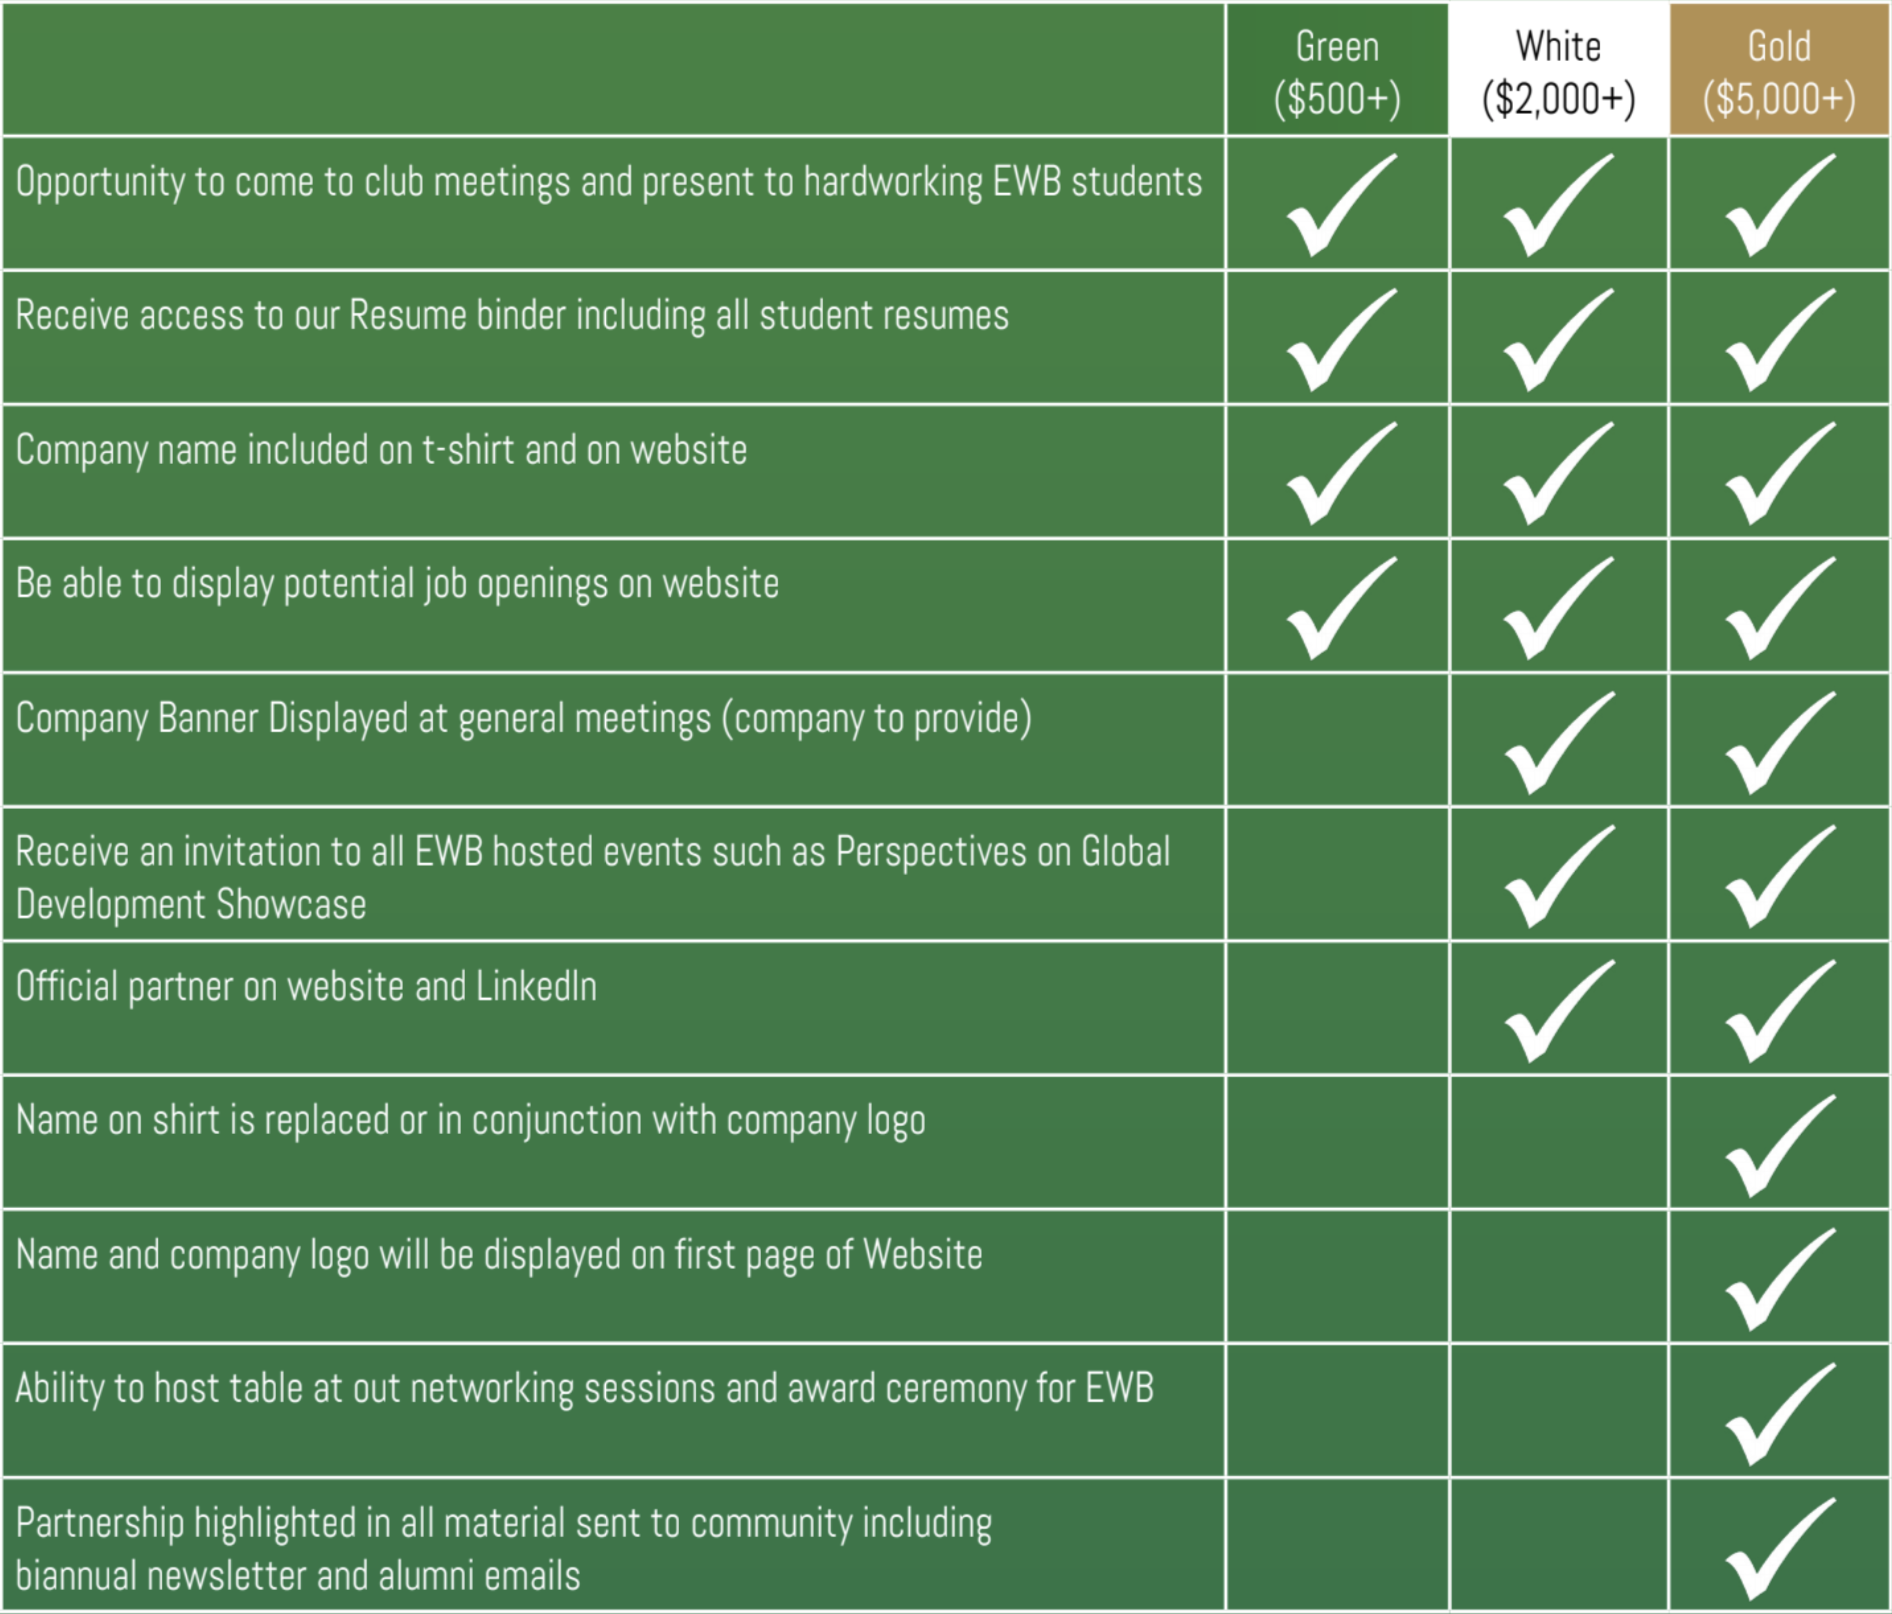 Website Partnership Table.jpg